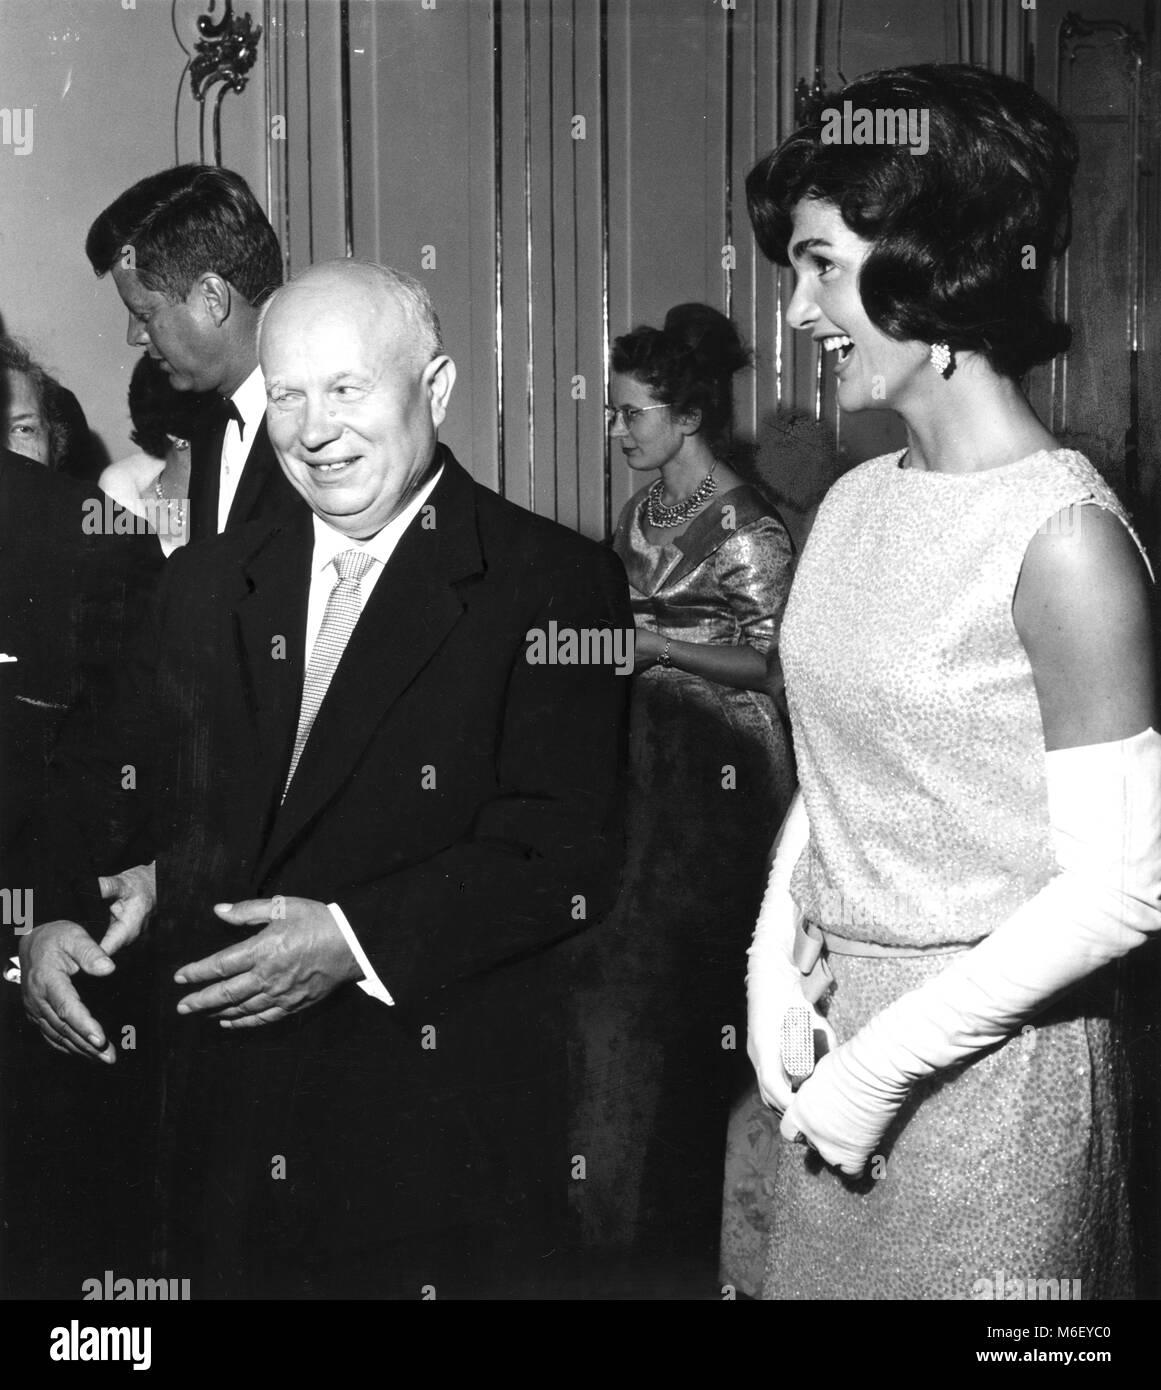 Mrs Jacqueline Kennedy, wife of the U S President John F Kennedy, and Soviet Premier Nikita Khrushchev enjoy a laugh - Stock Image